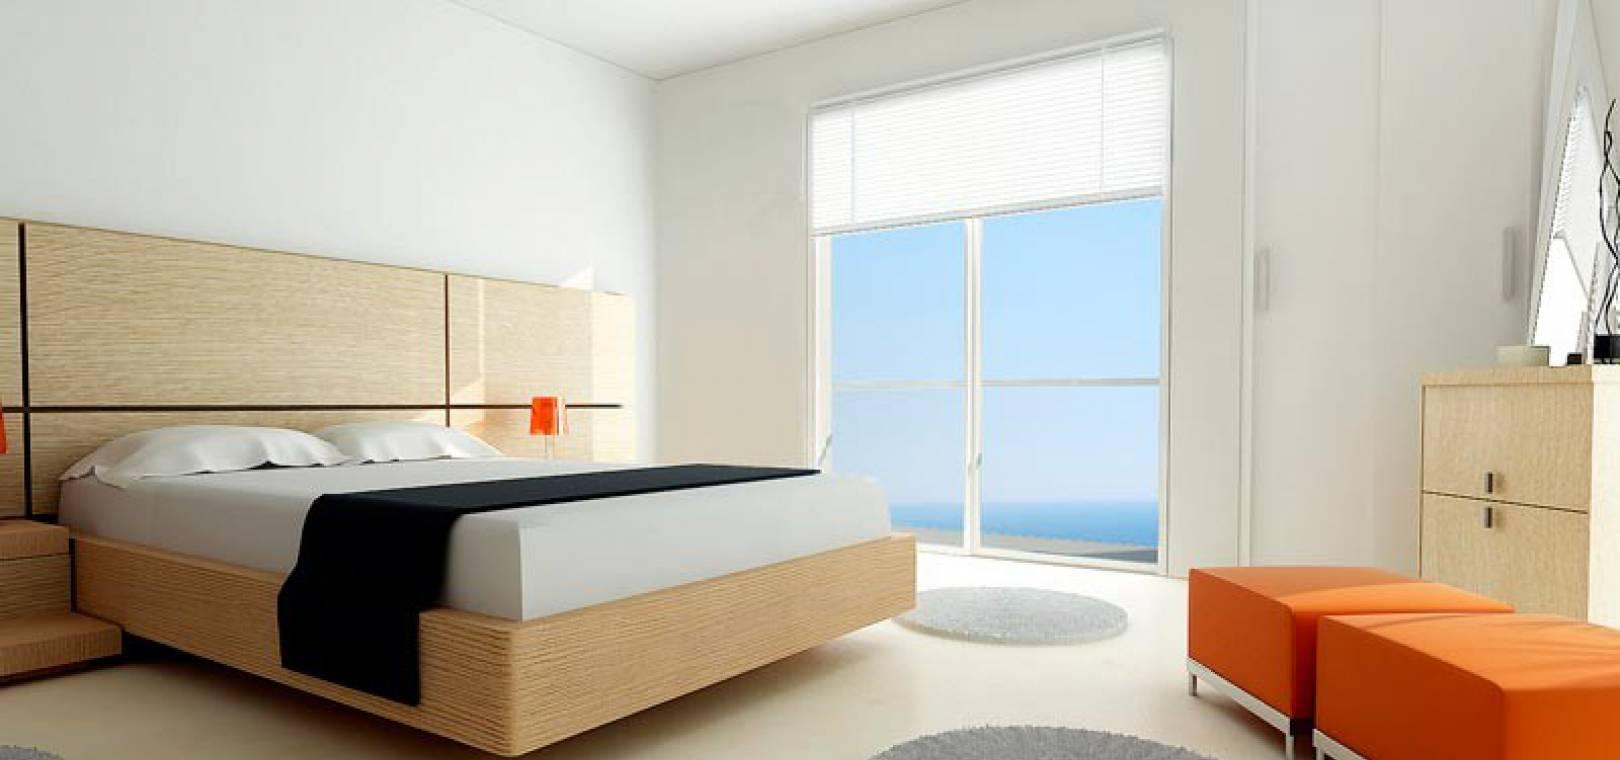 to buy,villas,modern,guardamar hills,guardamar,costa,blanca,op16-bed2